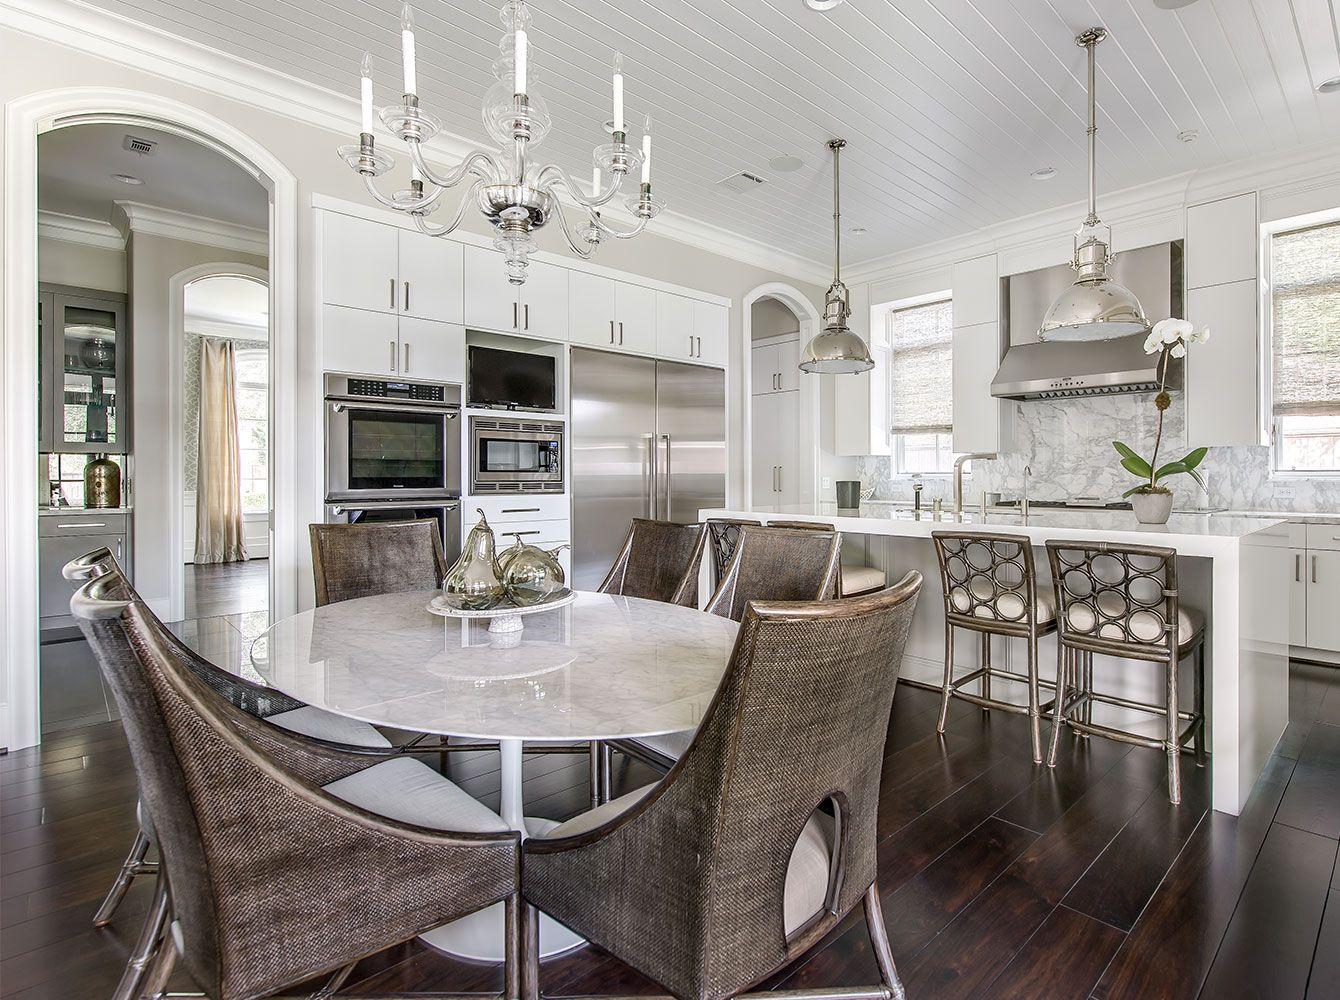 Elizabeth Garrett Interiors Is A Full Service Interior Design Firm Specializing In High End Residential